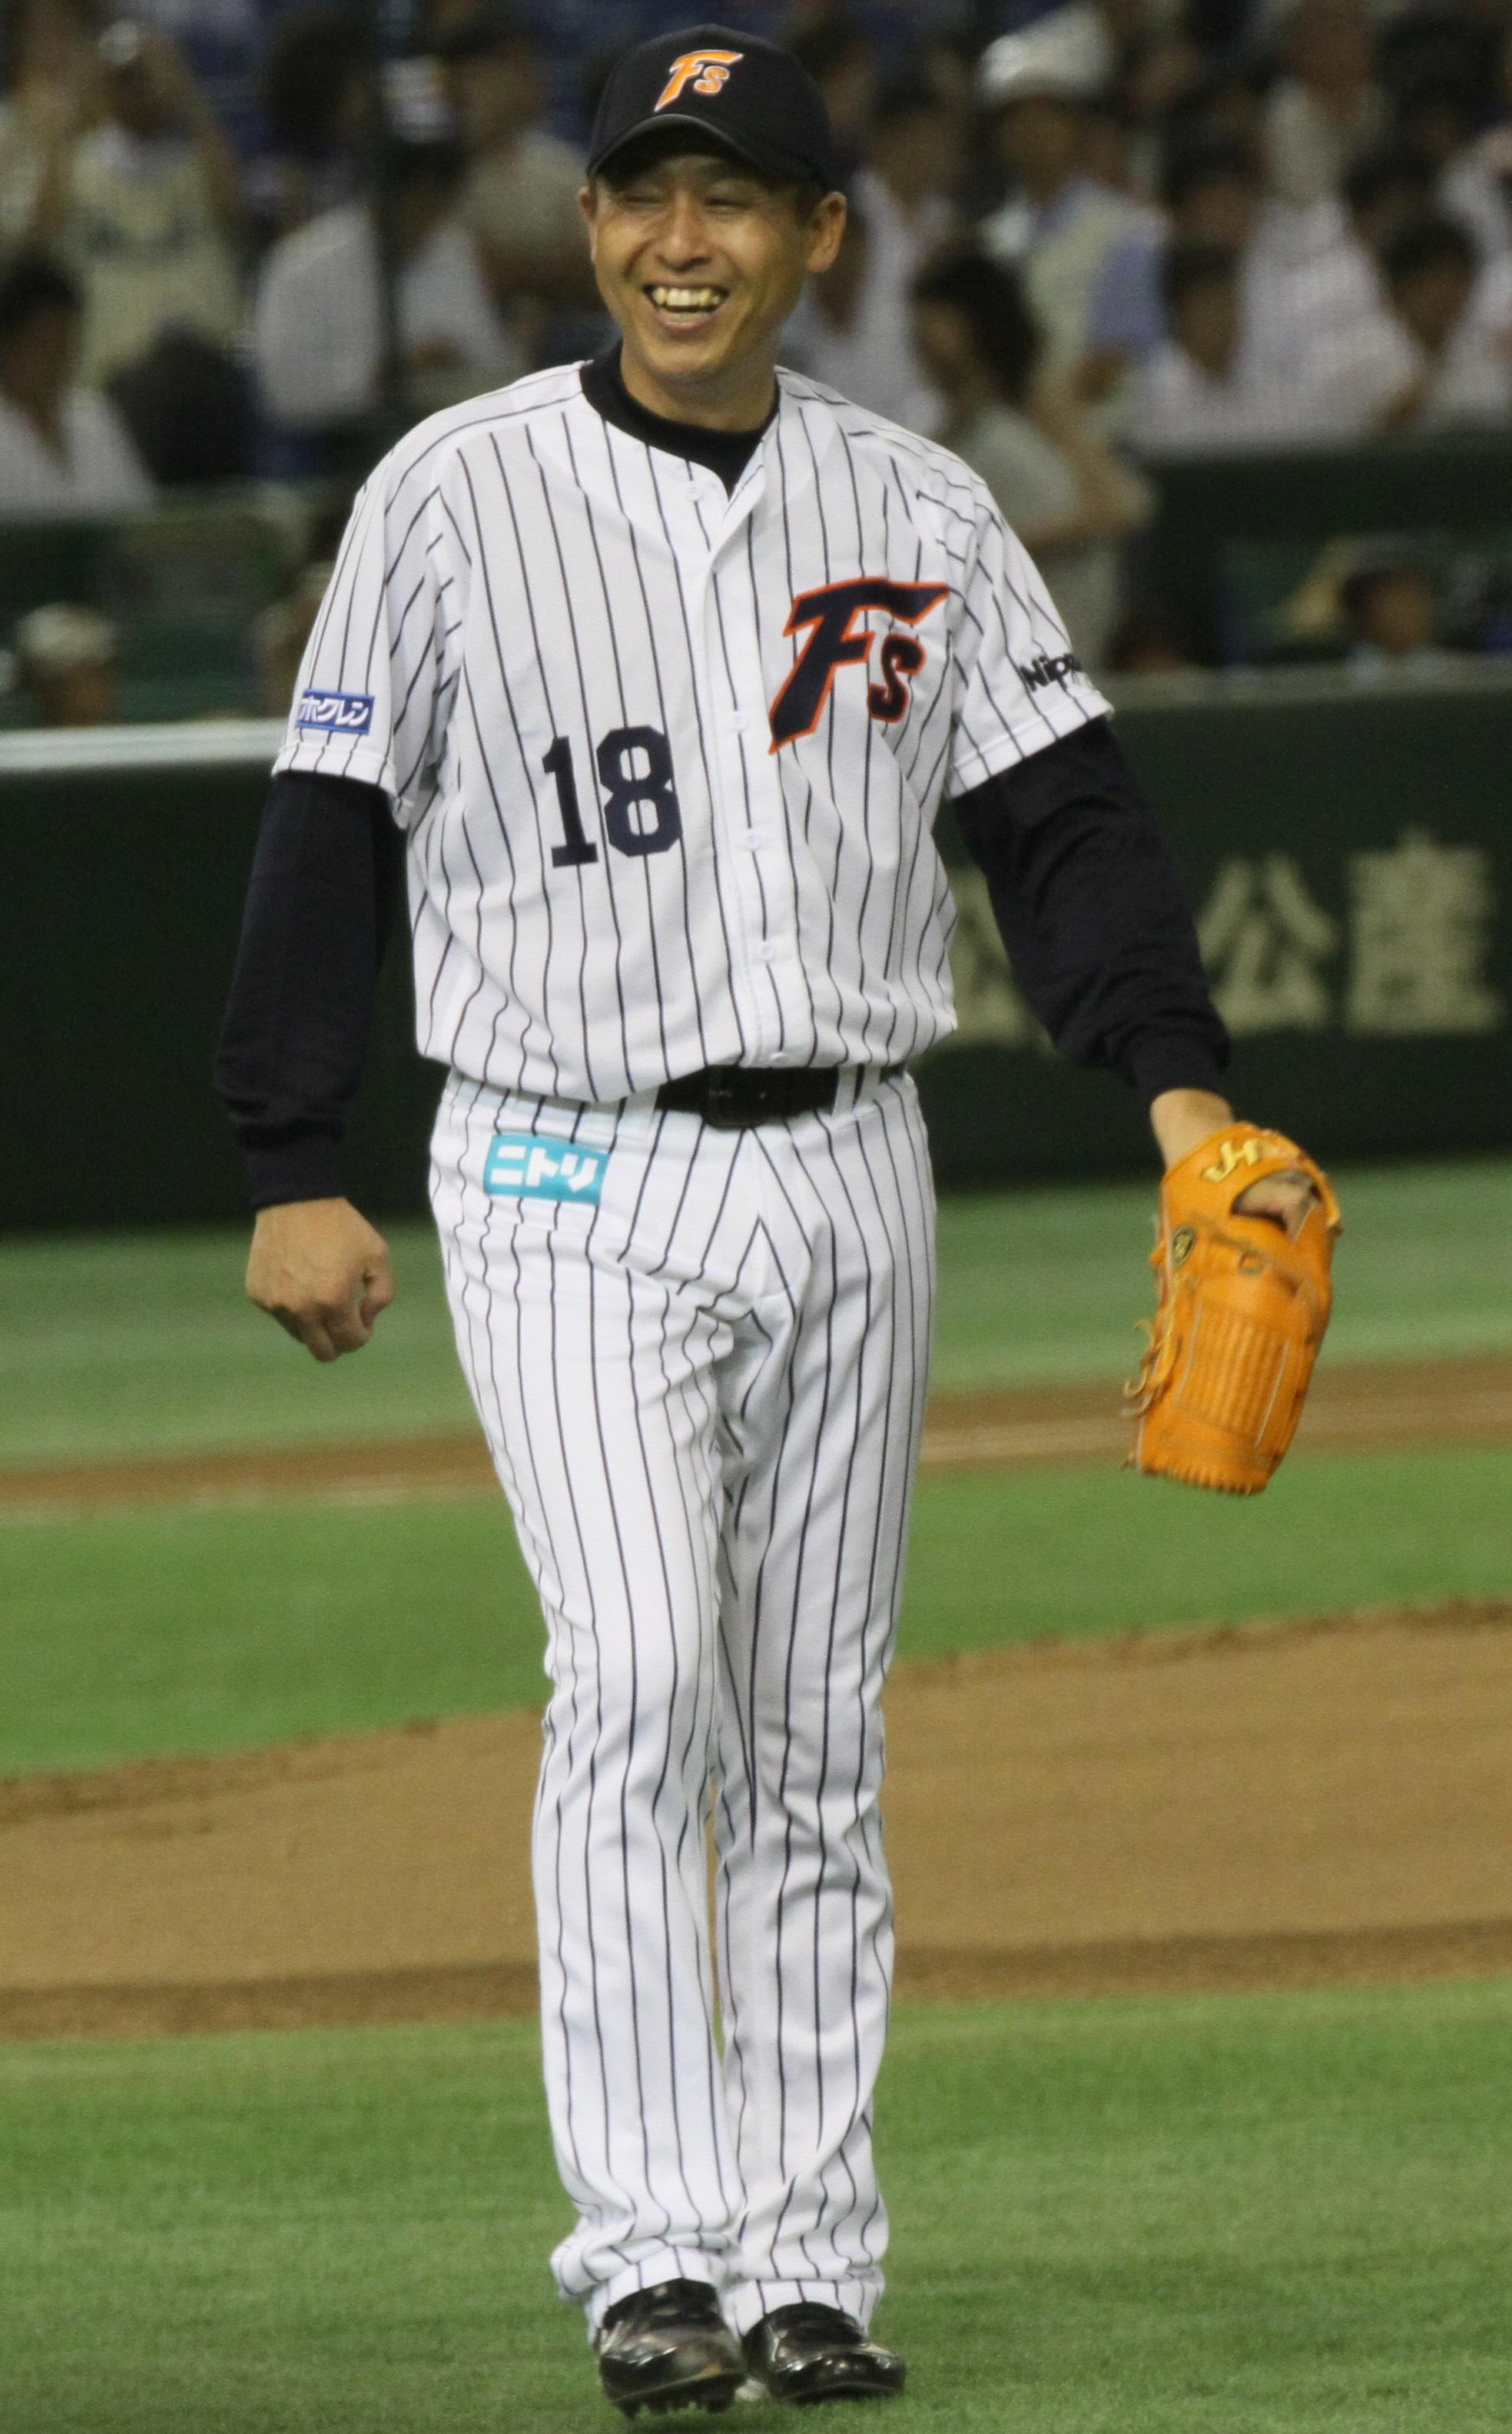 岩本勉 - Wikipedia